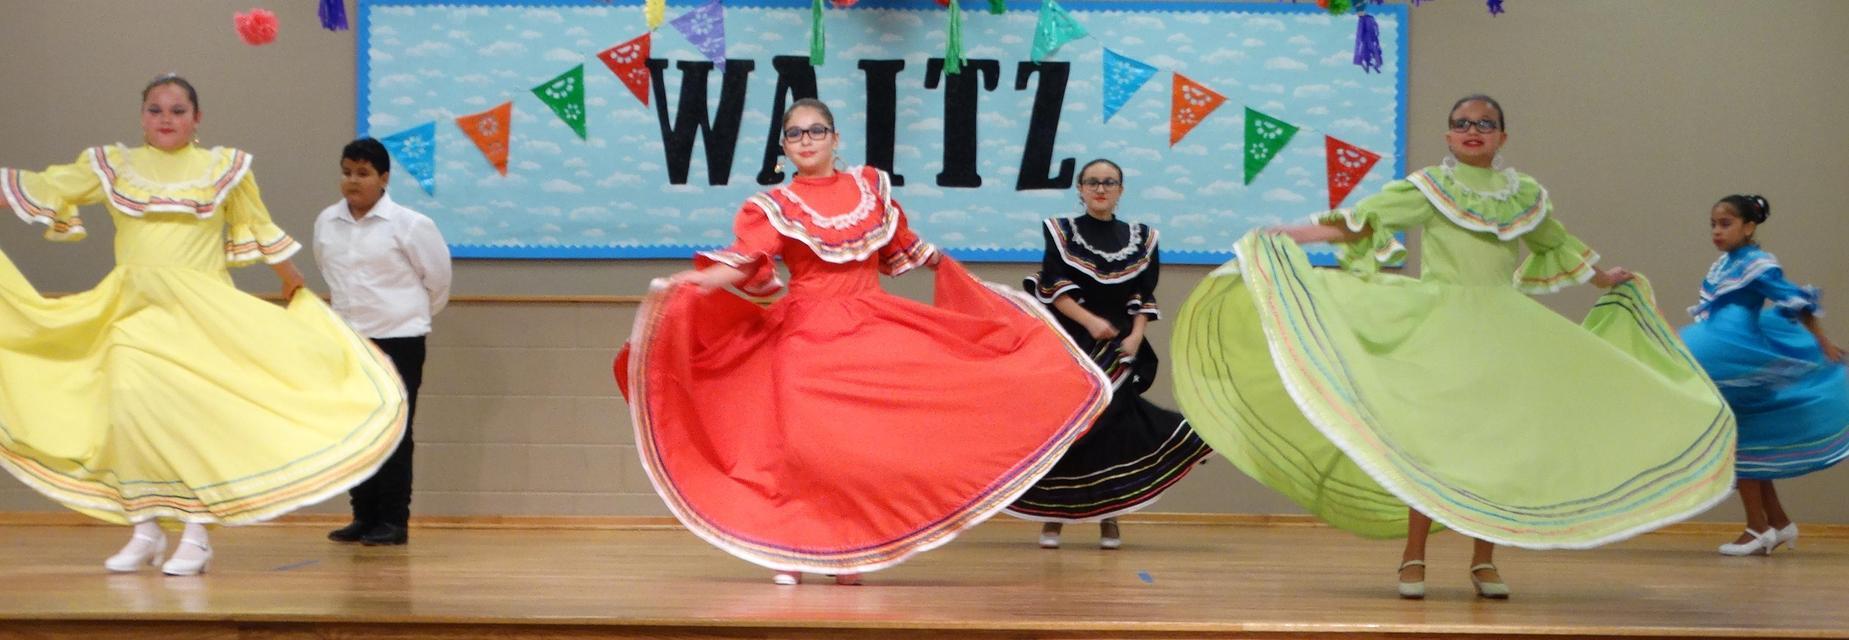 folklorico dancers on stage